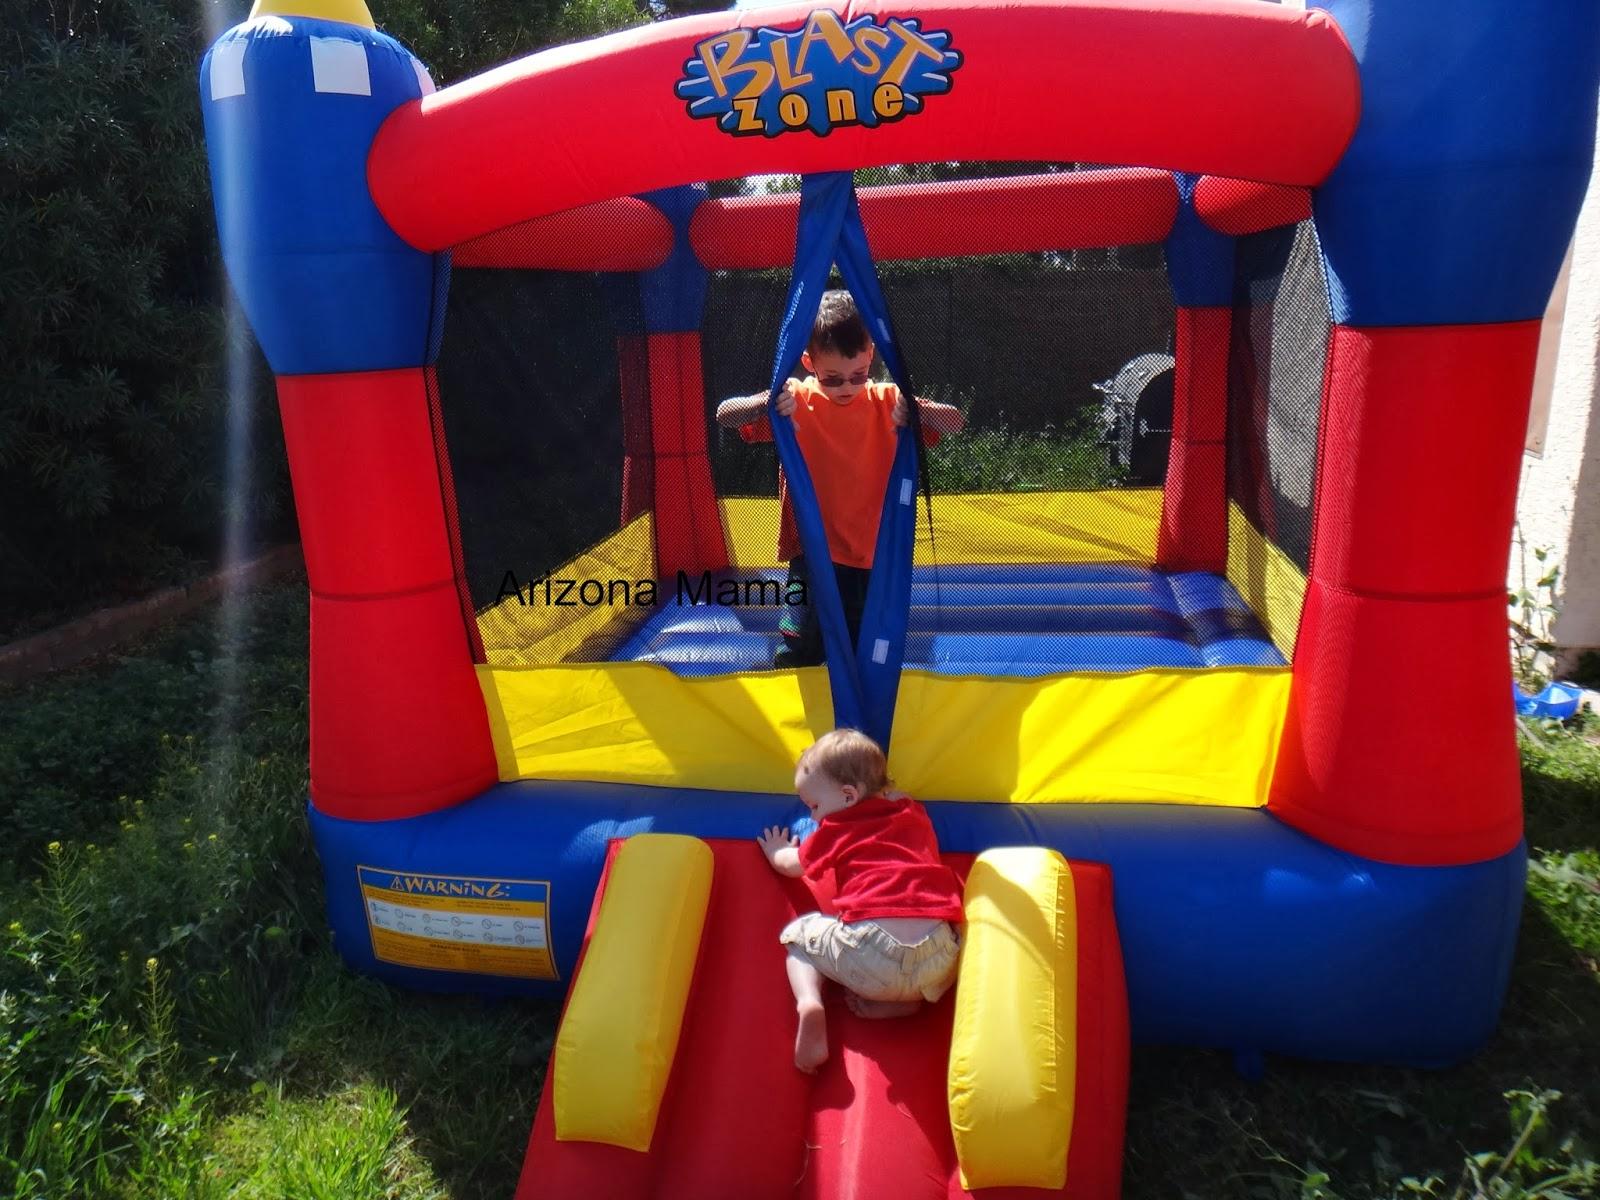 Arizona mama magic castle bounce house from blast zone for Blast zone magic castle inflatable bounce house